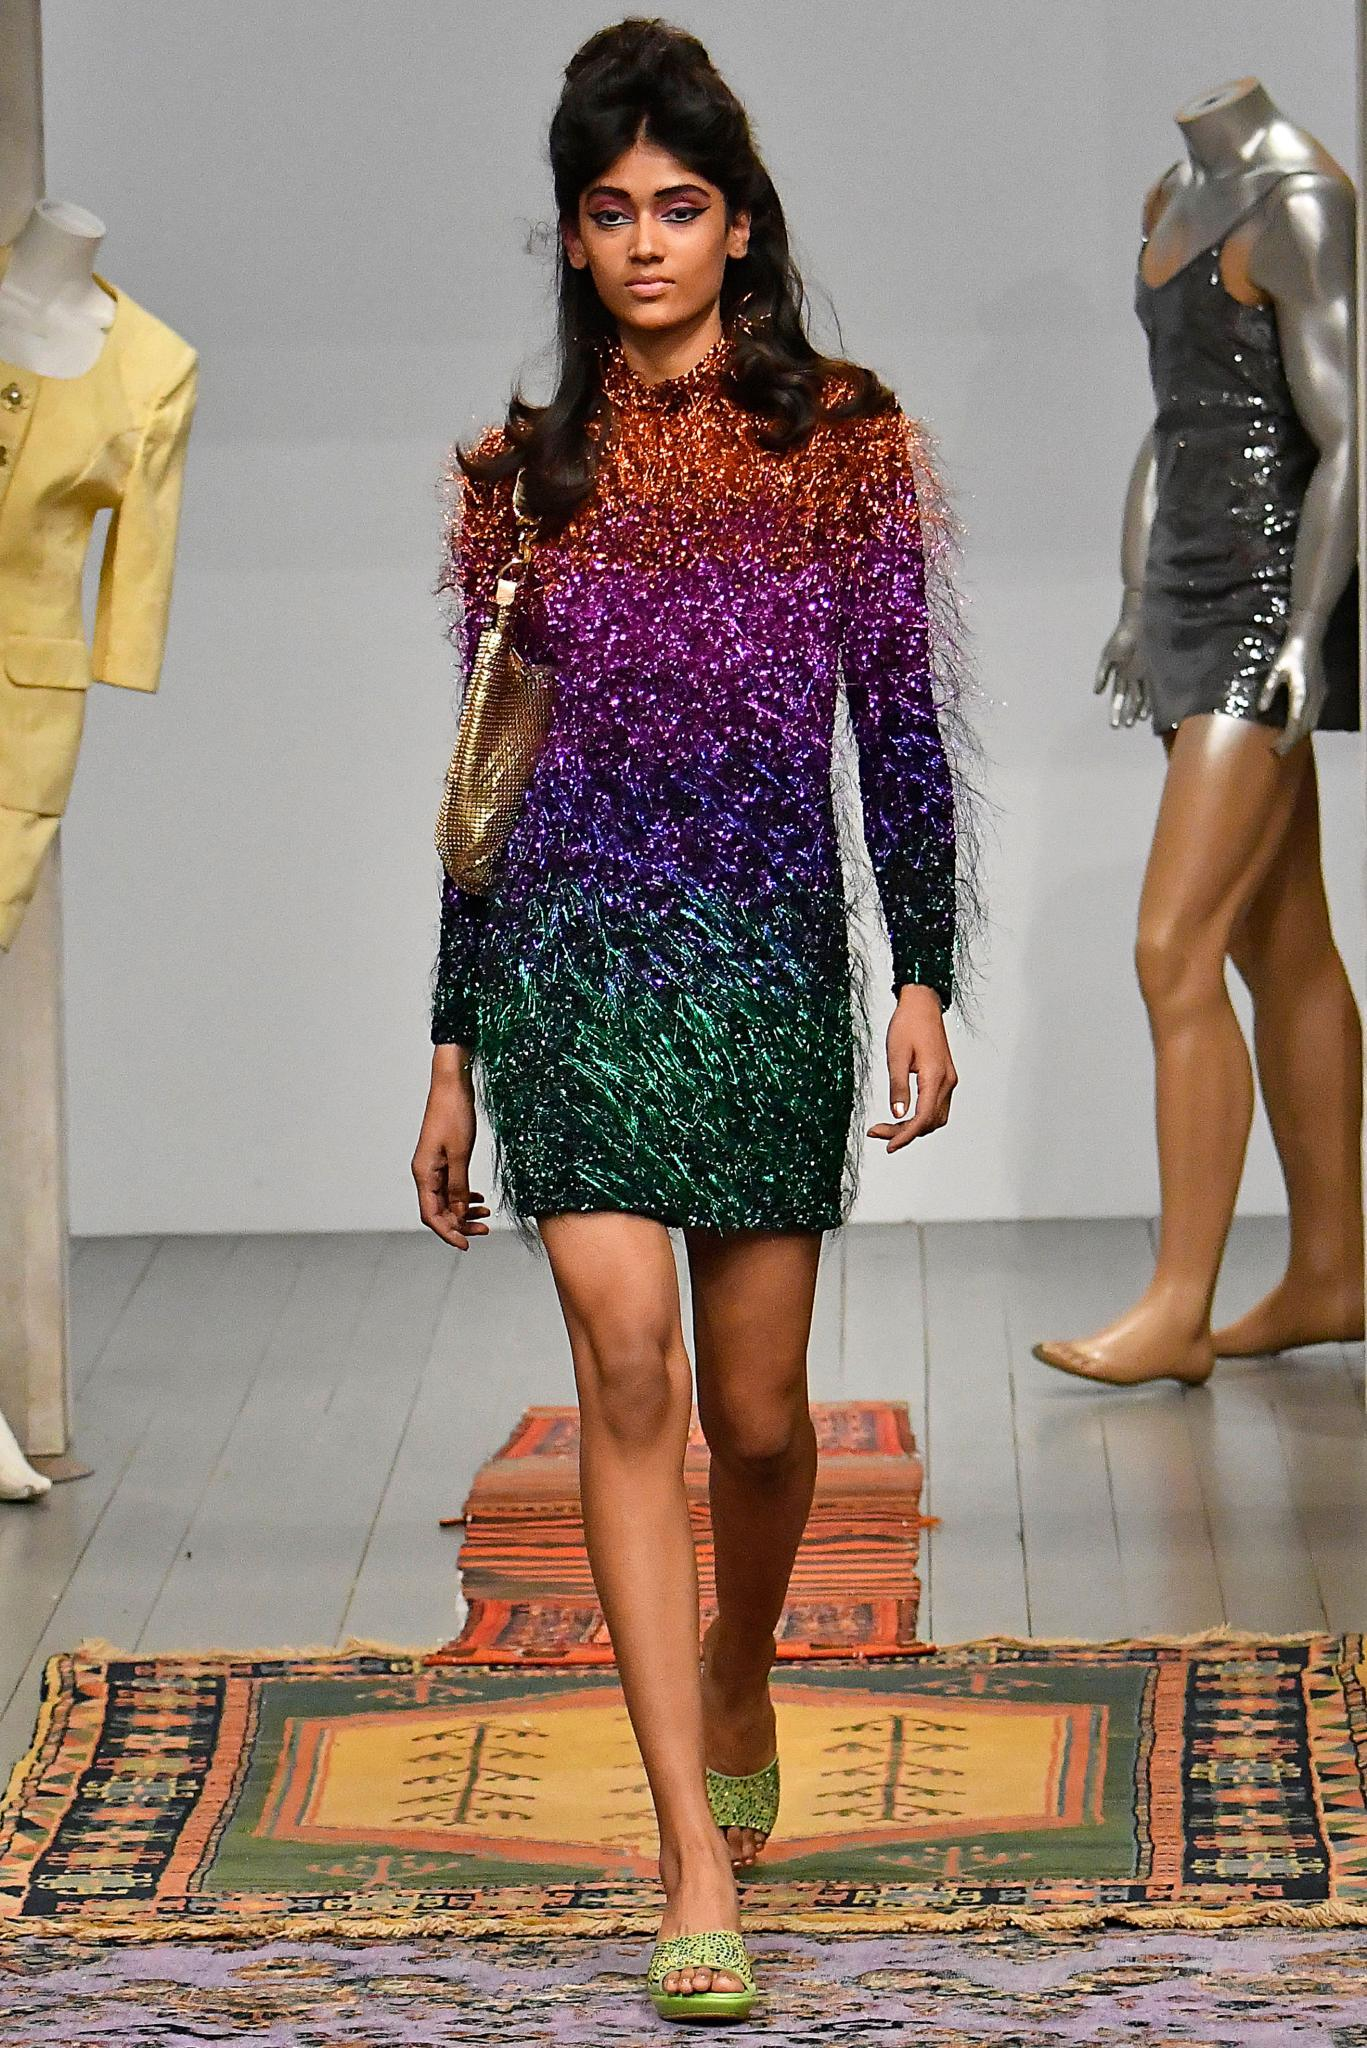 a beautiful female fashion model walking on a runway